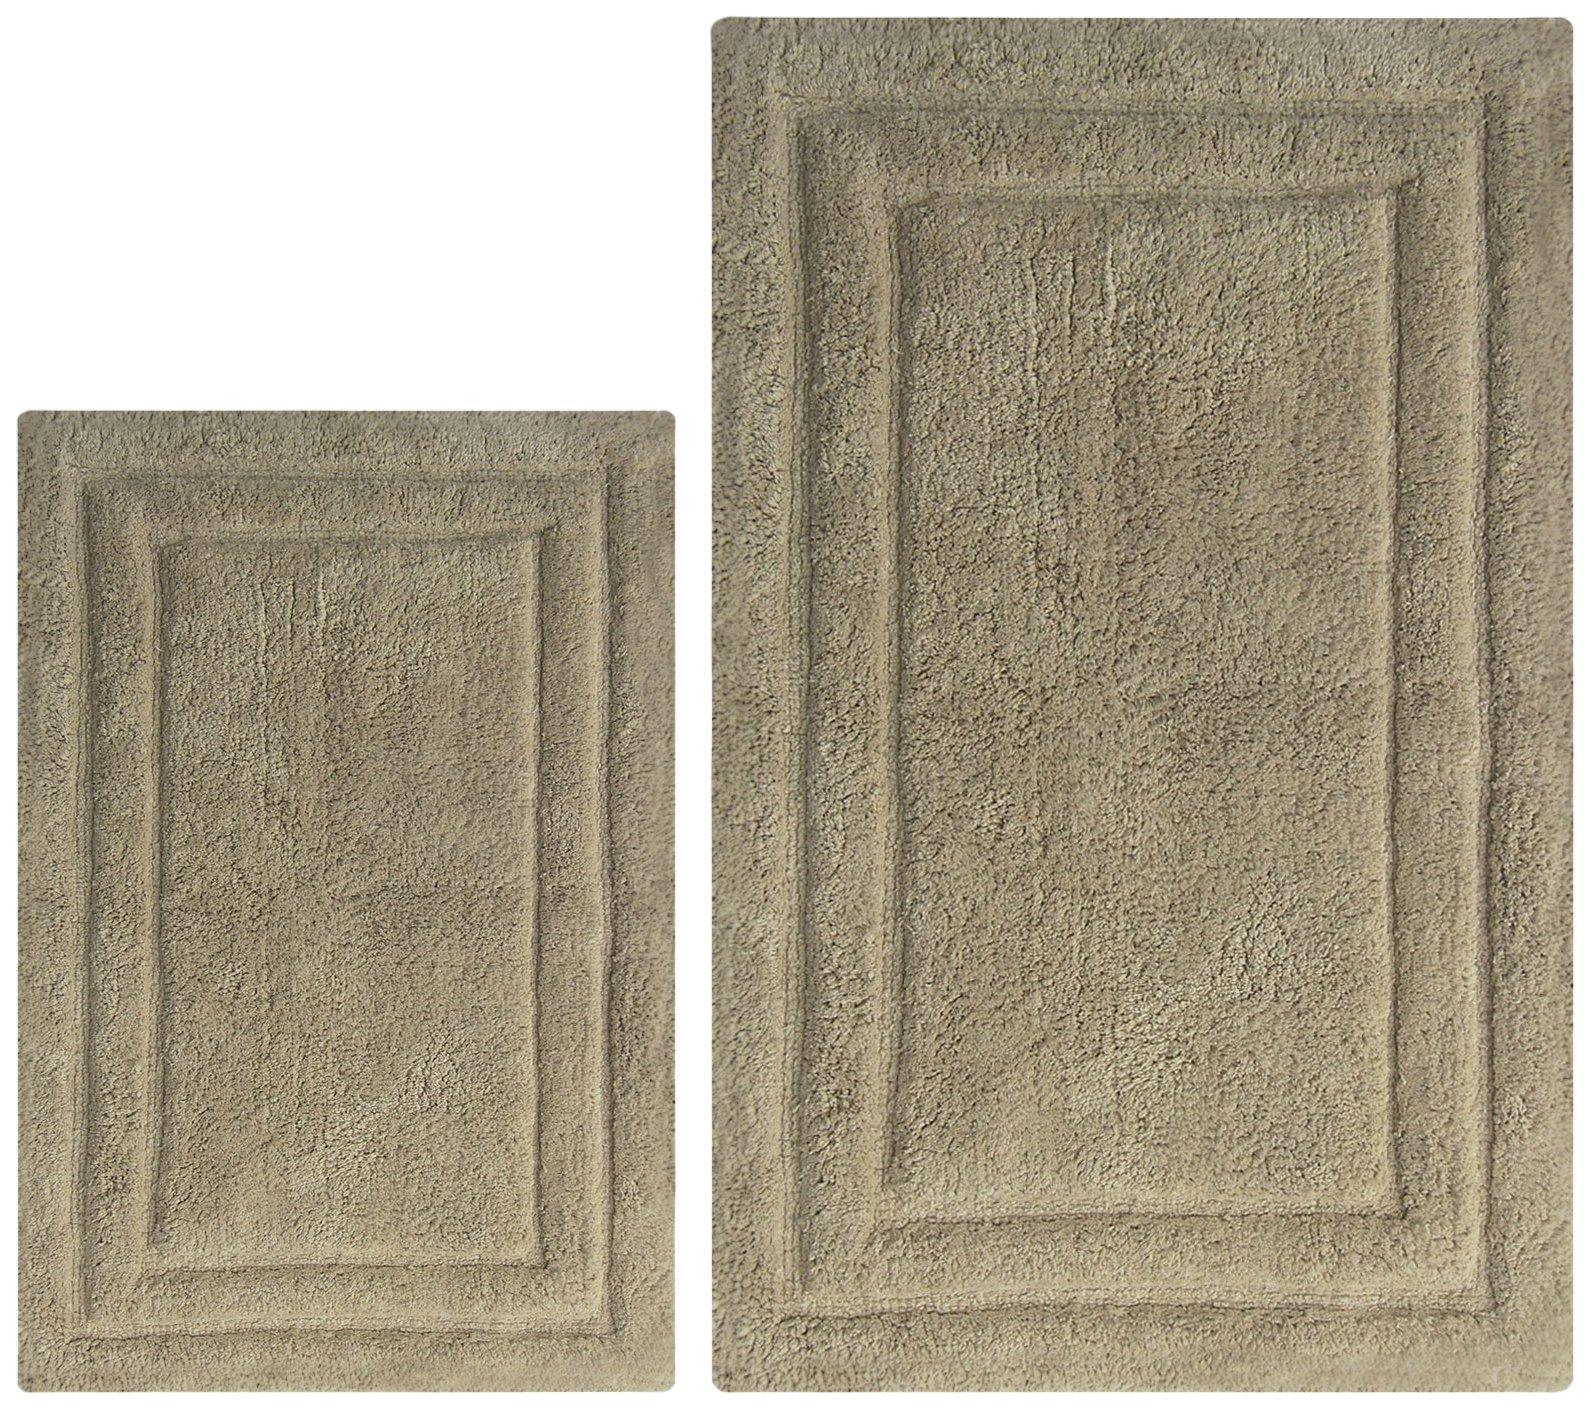 Chardin home - 100% Cotton two Piece Classicc Bath Rug Set, (21''x34'' & 17''x24'') with anti-skid spray latex back, Linen